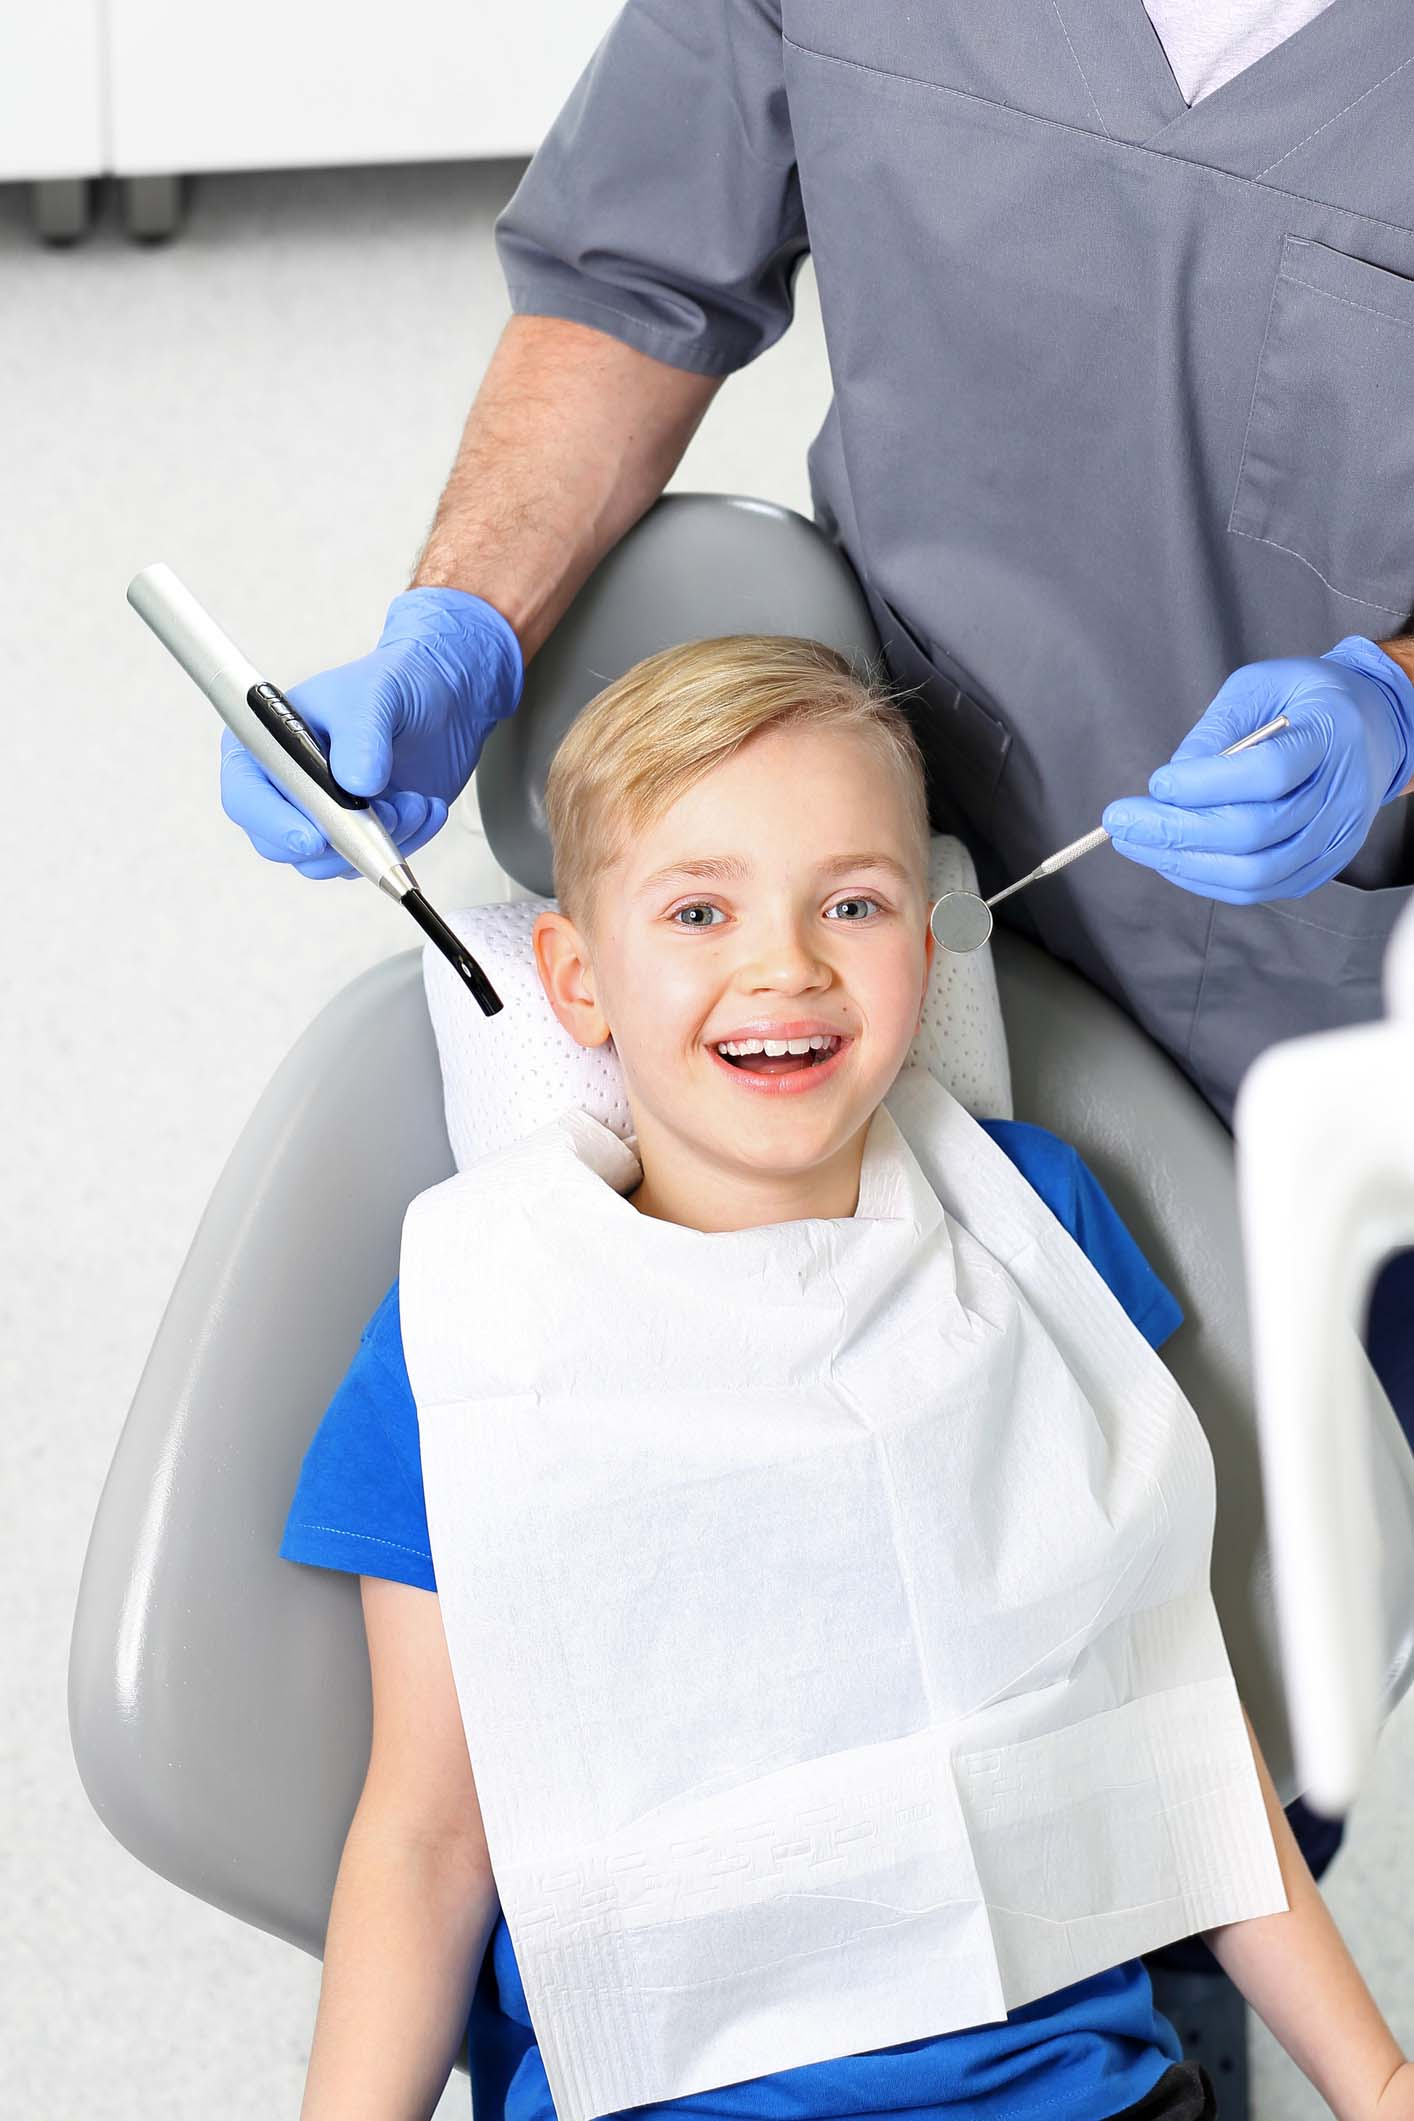 A child in a dental chair during a dental treatment